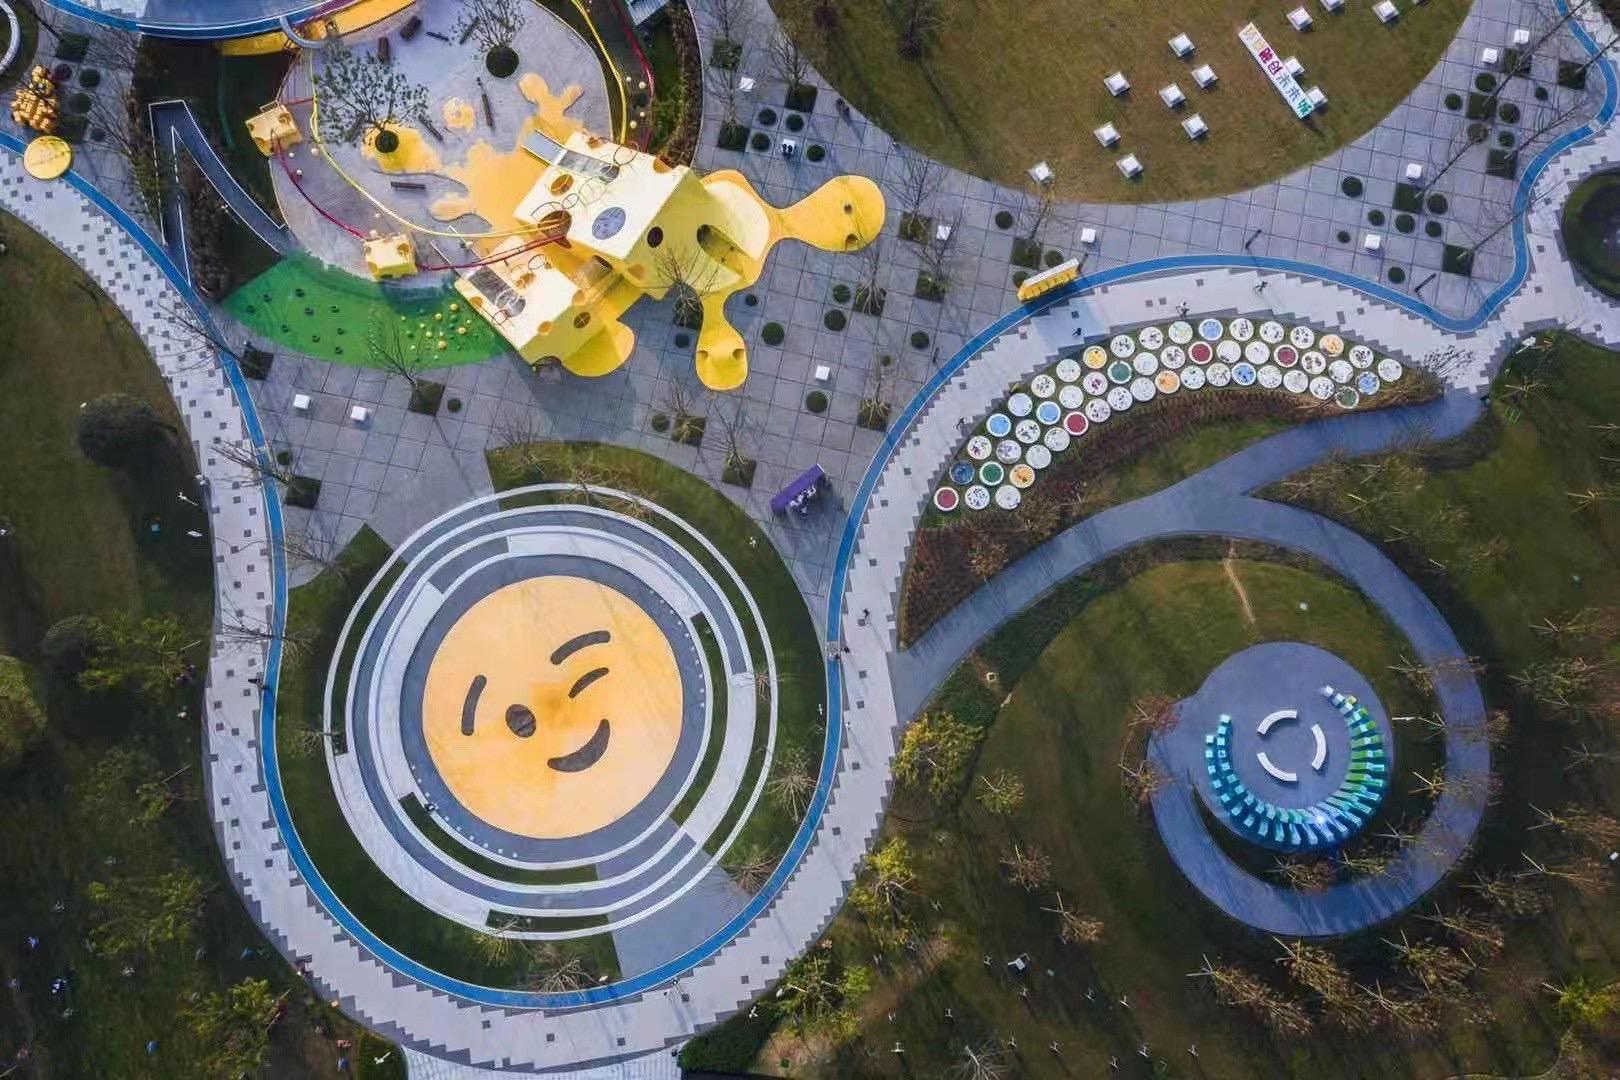 SUNAC LEGO HI-PARK